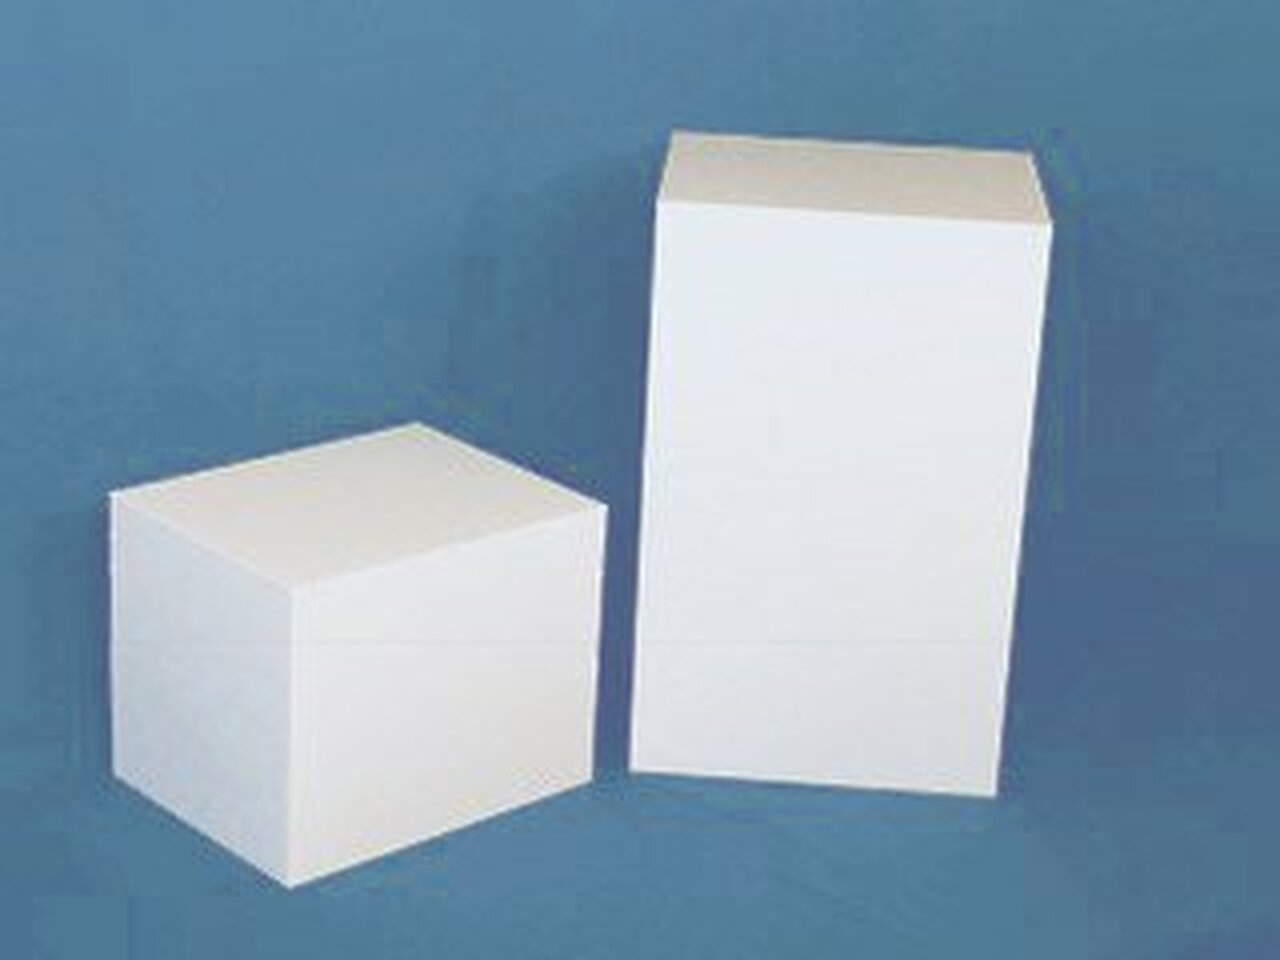 Rectangular Acrylic Display Cube - Gloss Finish - White